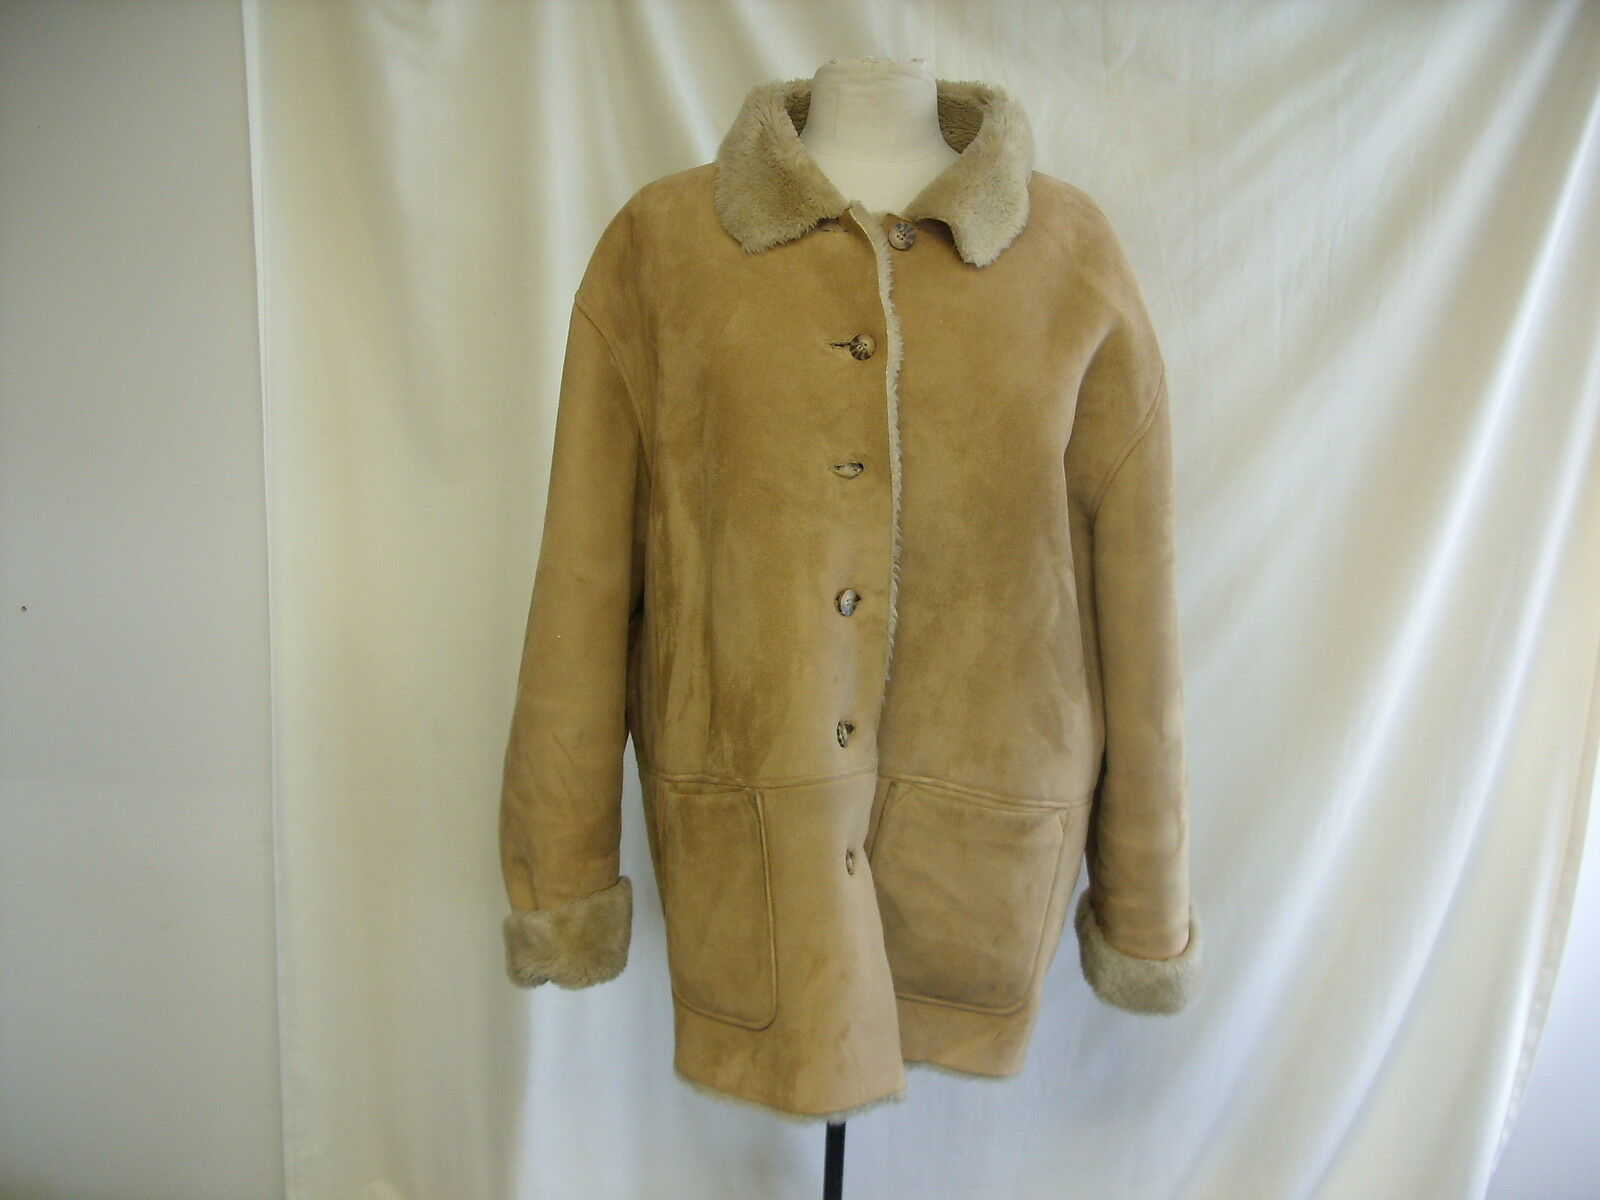 Ladies Coat -Elizabeth by Liz Claiborne, Size XL, Beige, 100% Polyester  1073